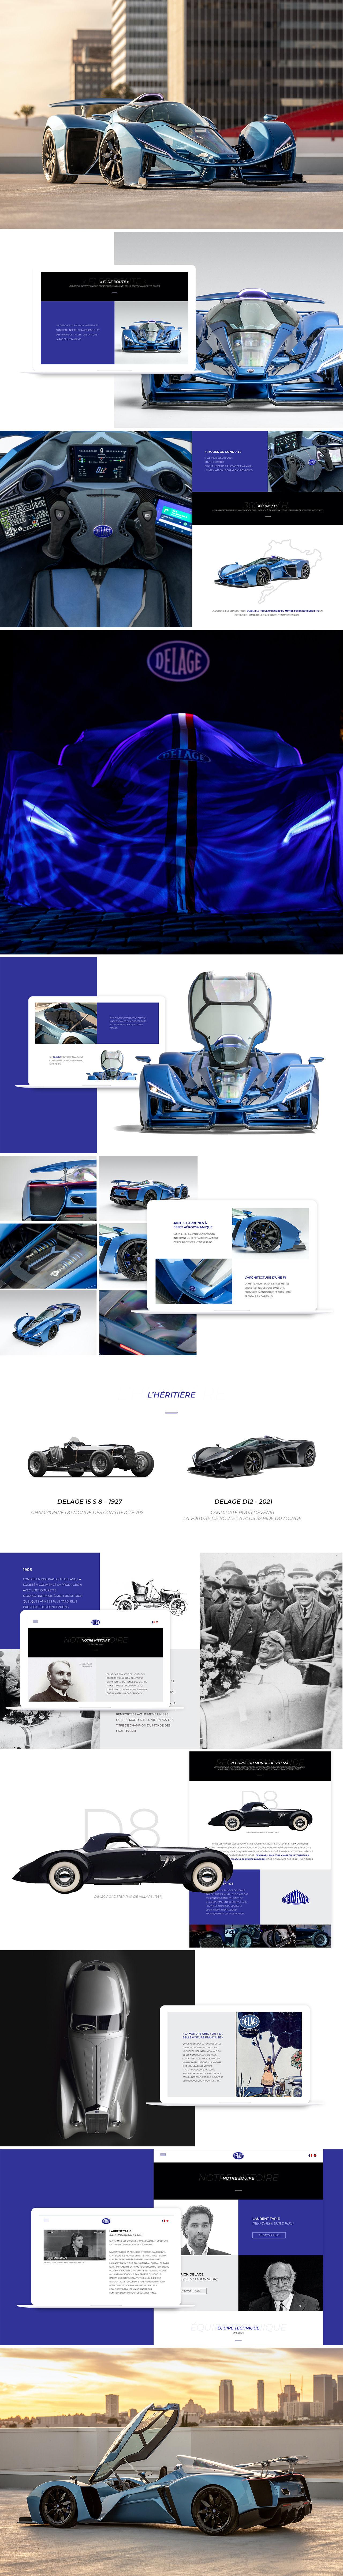 Delage-automobiles.com